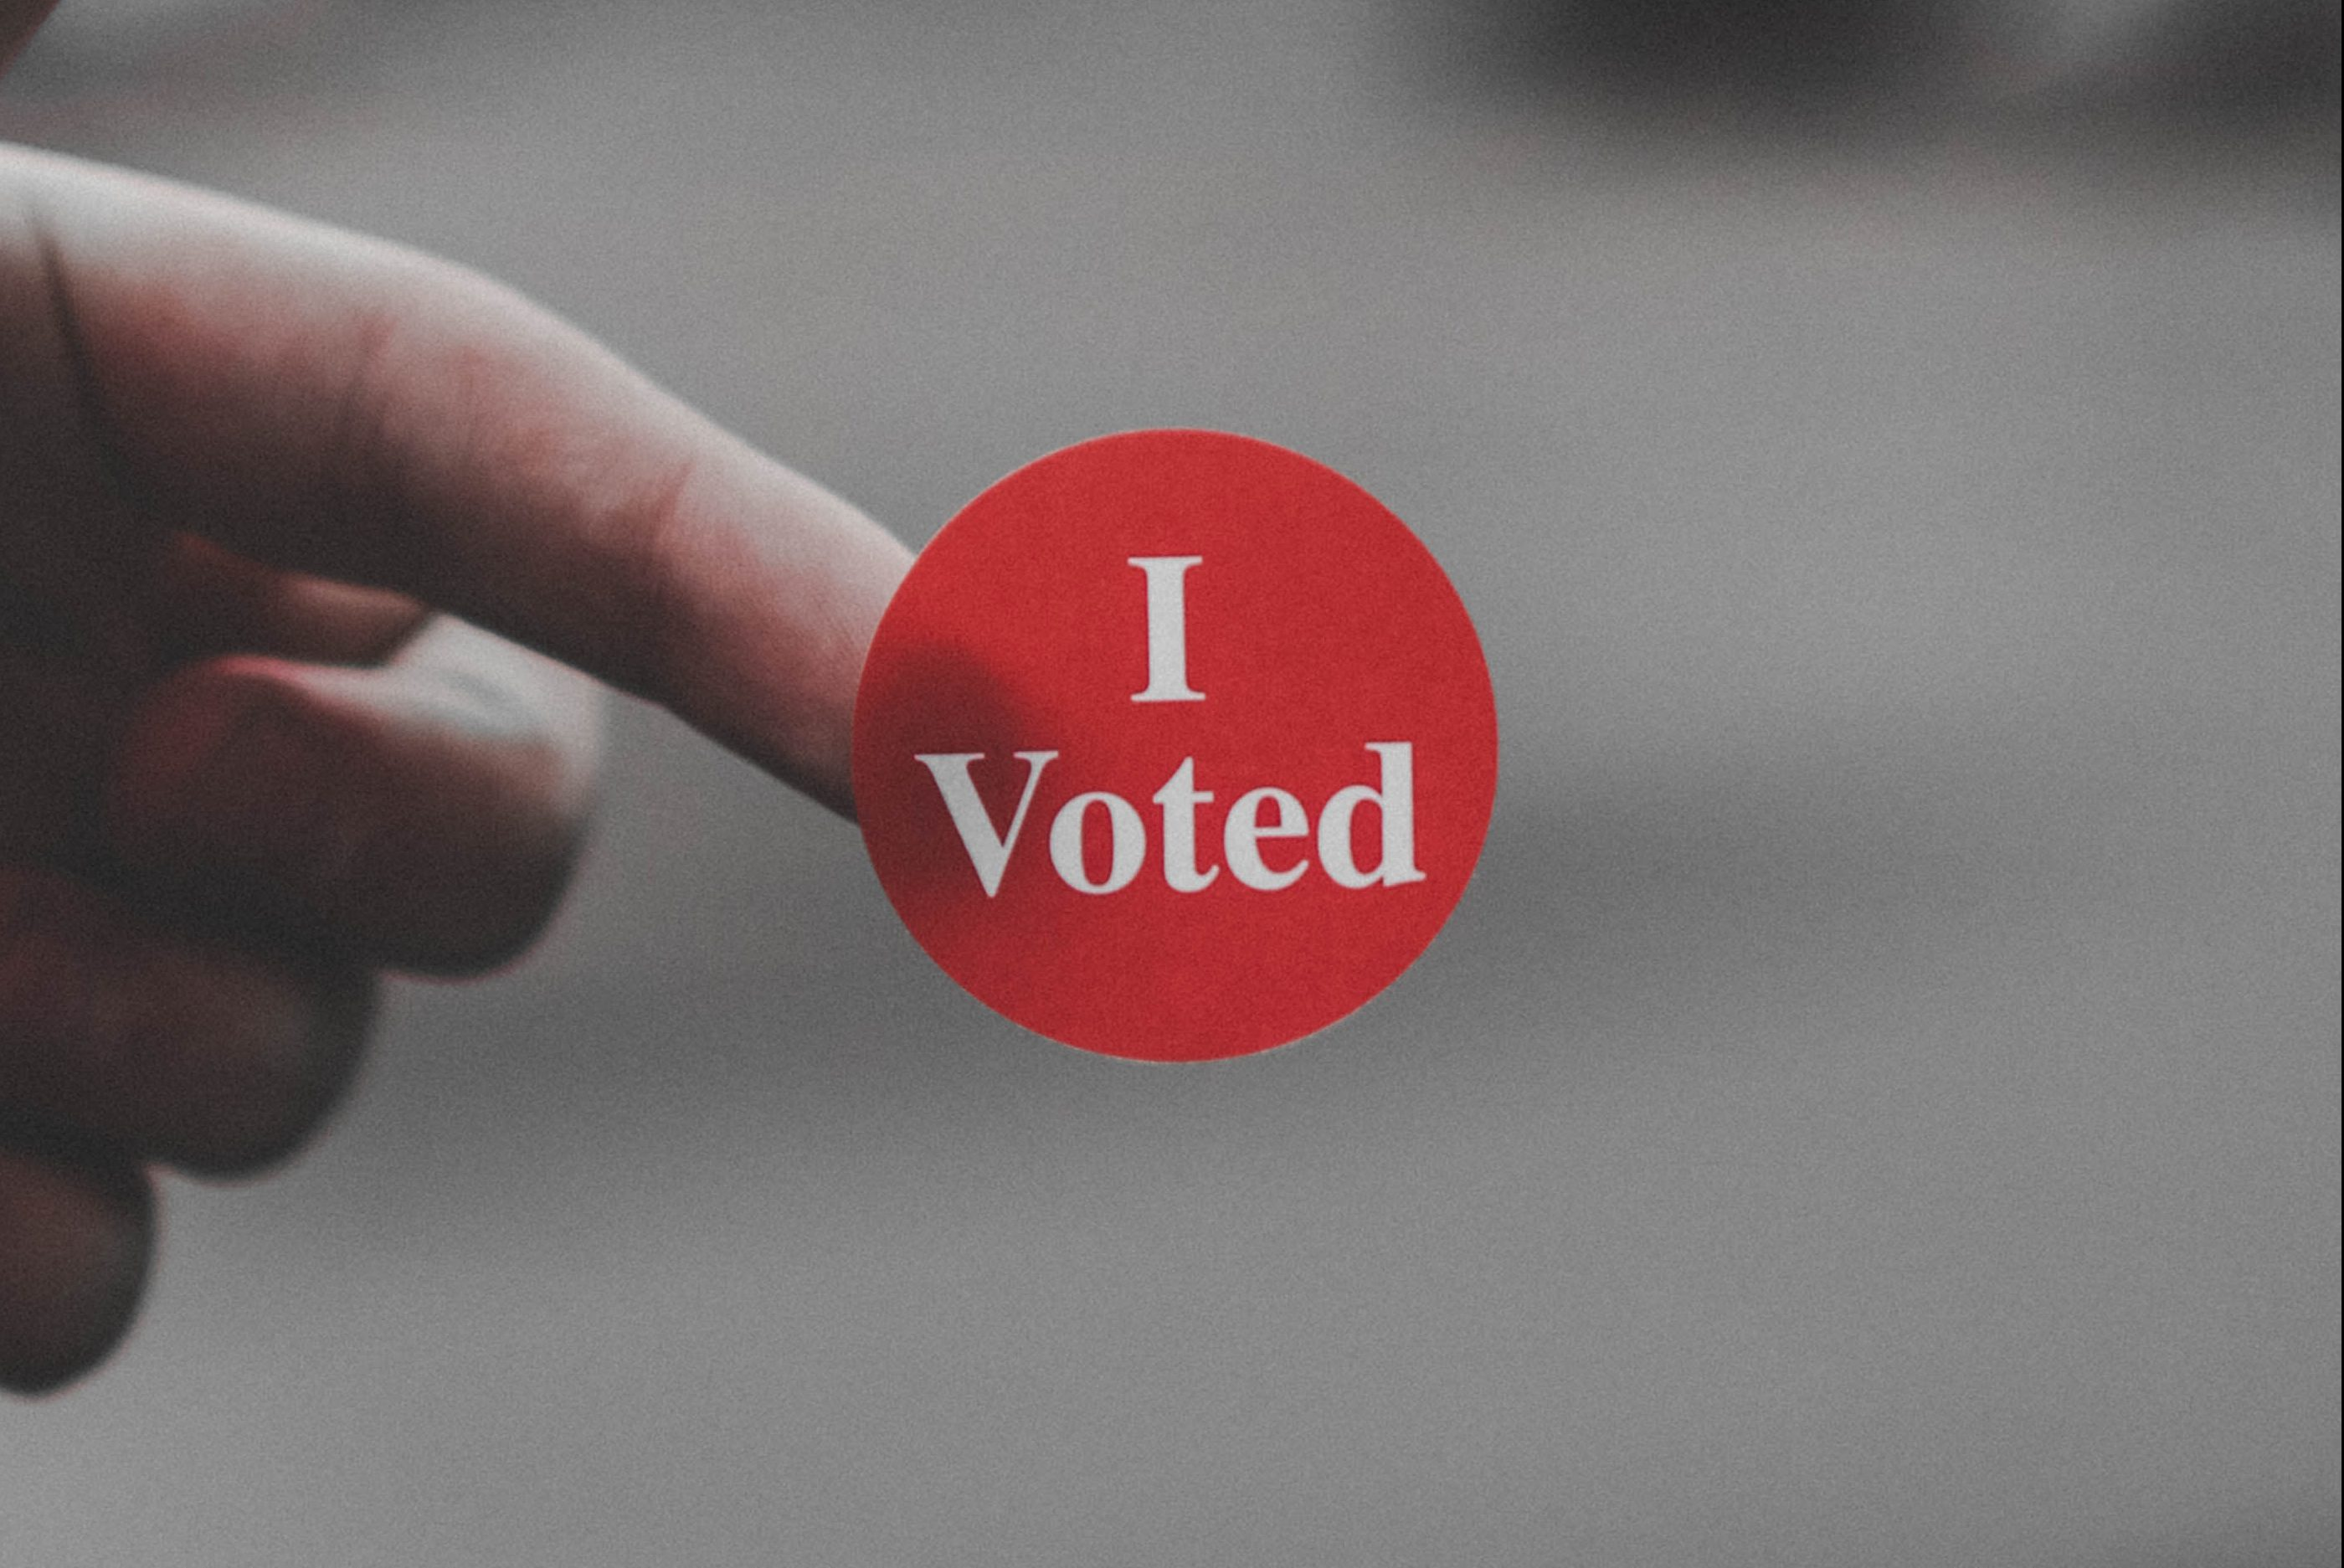 Idiot: The Case for Compulsory Voting Parker-johnson-v0OWc_skg0g-unsplash-e1575062146885